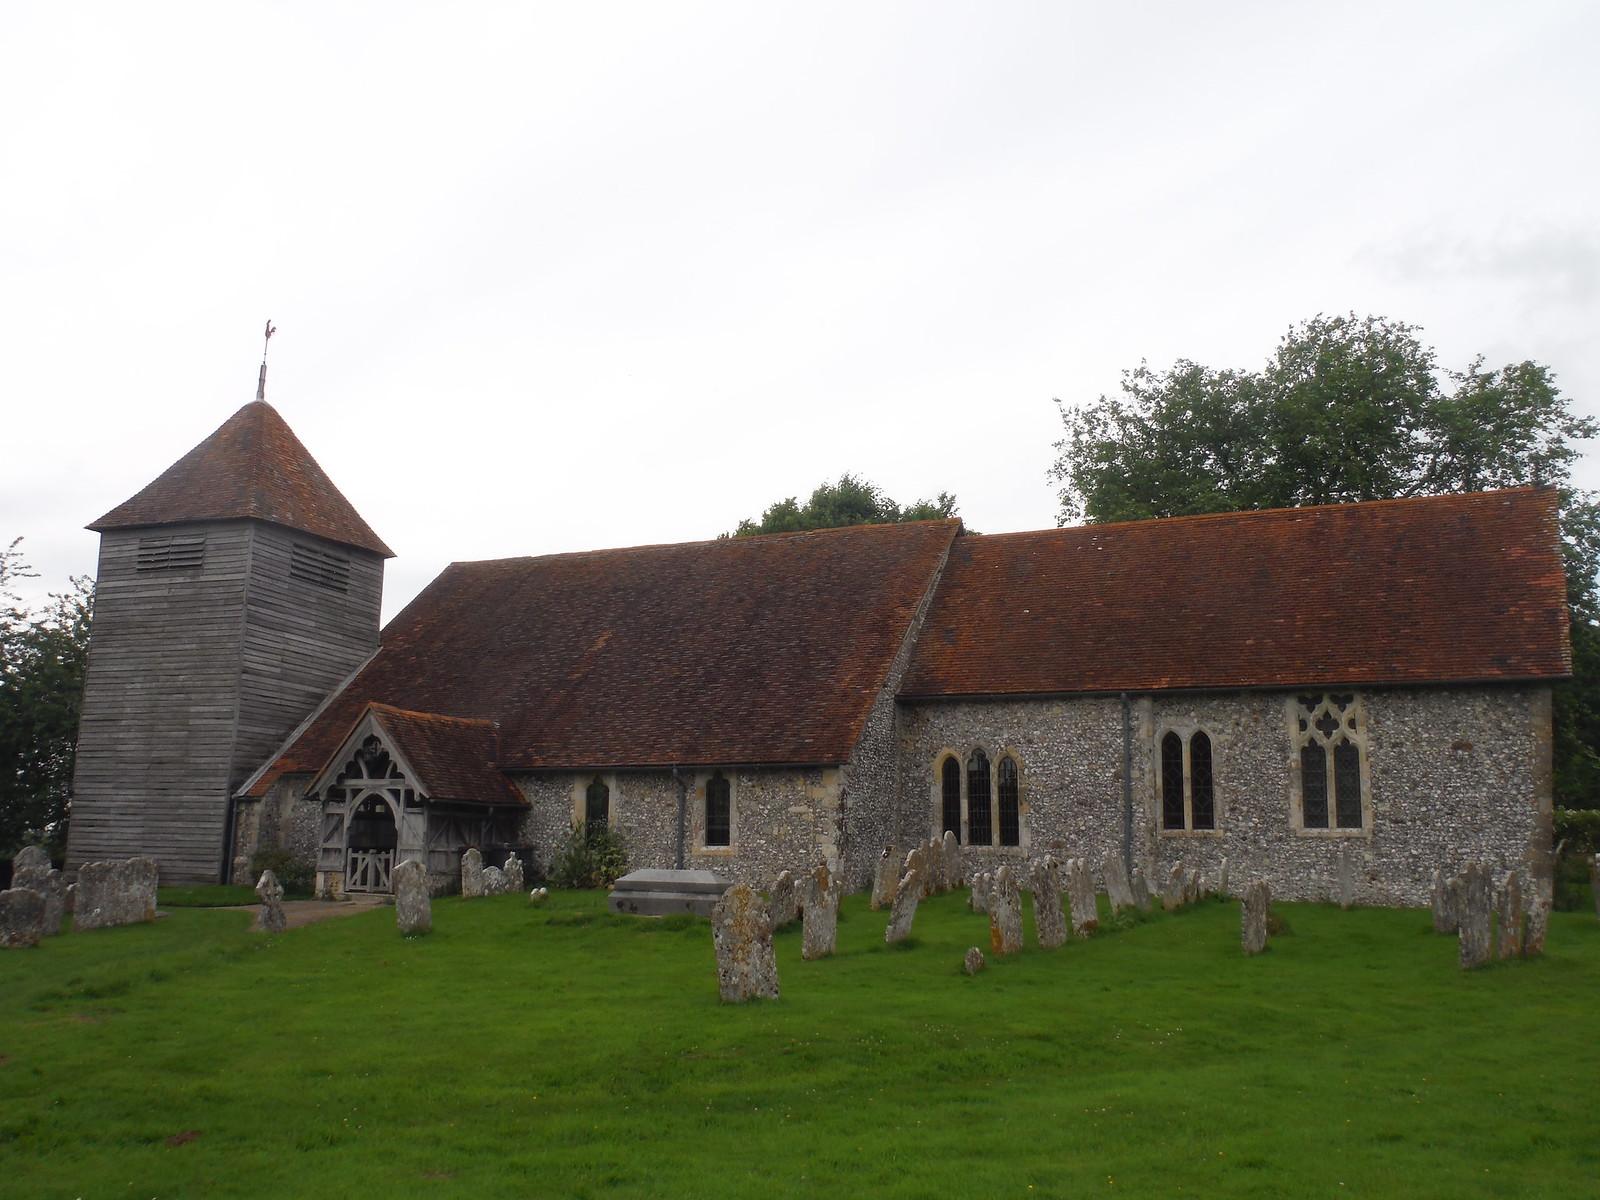 St. Mary's, Michelmersh SWC Walk 265 - Dean to Mottisfont and Dunbridge